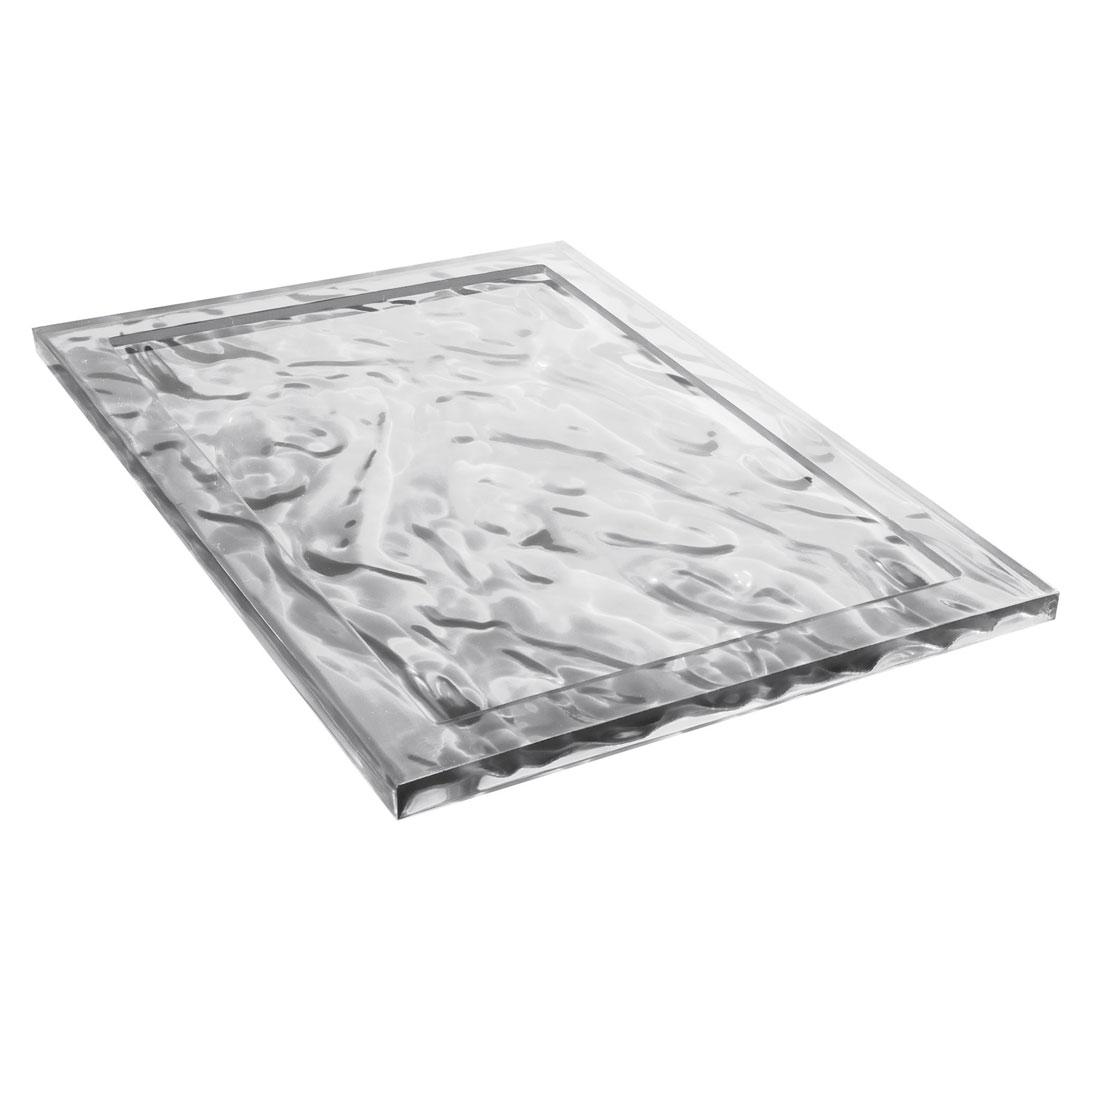 kartell dune tray  designed by mario bellini -